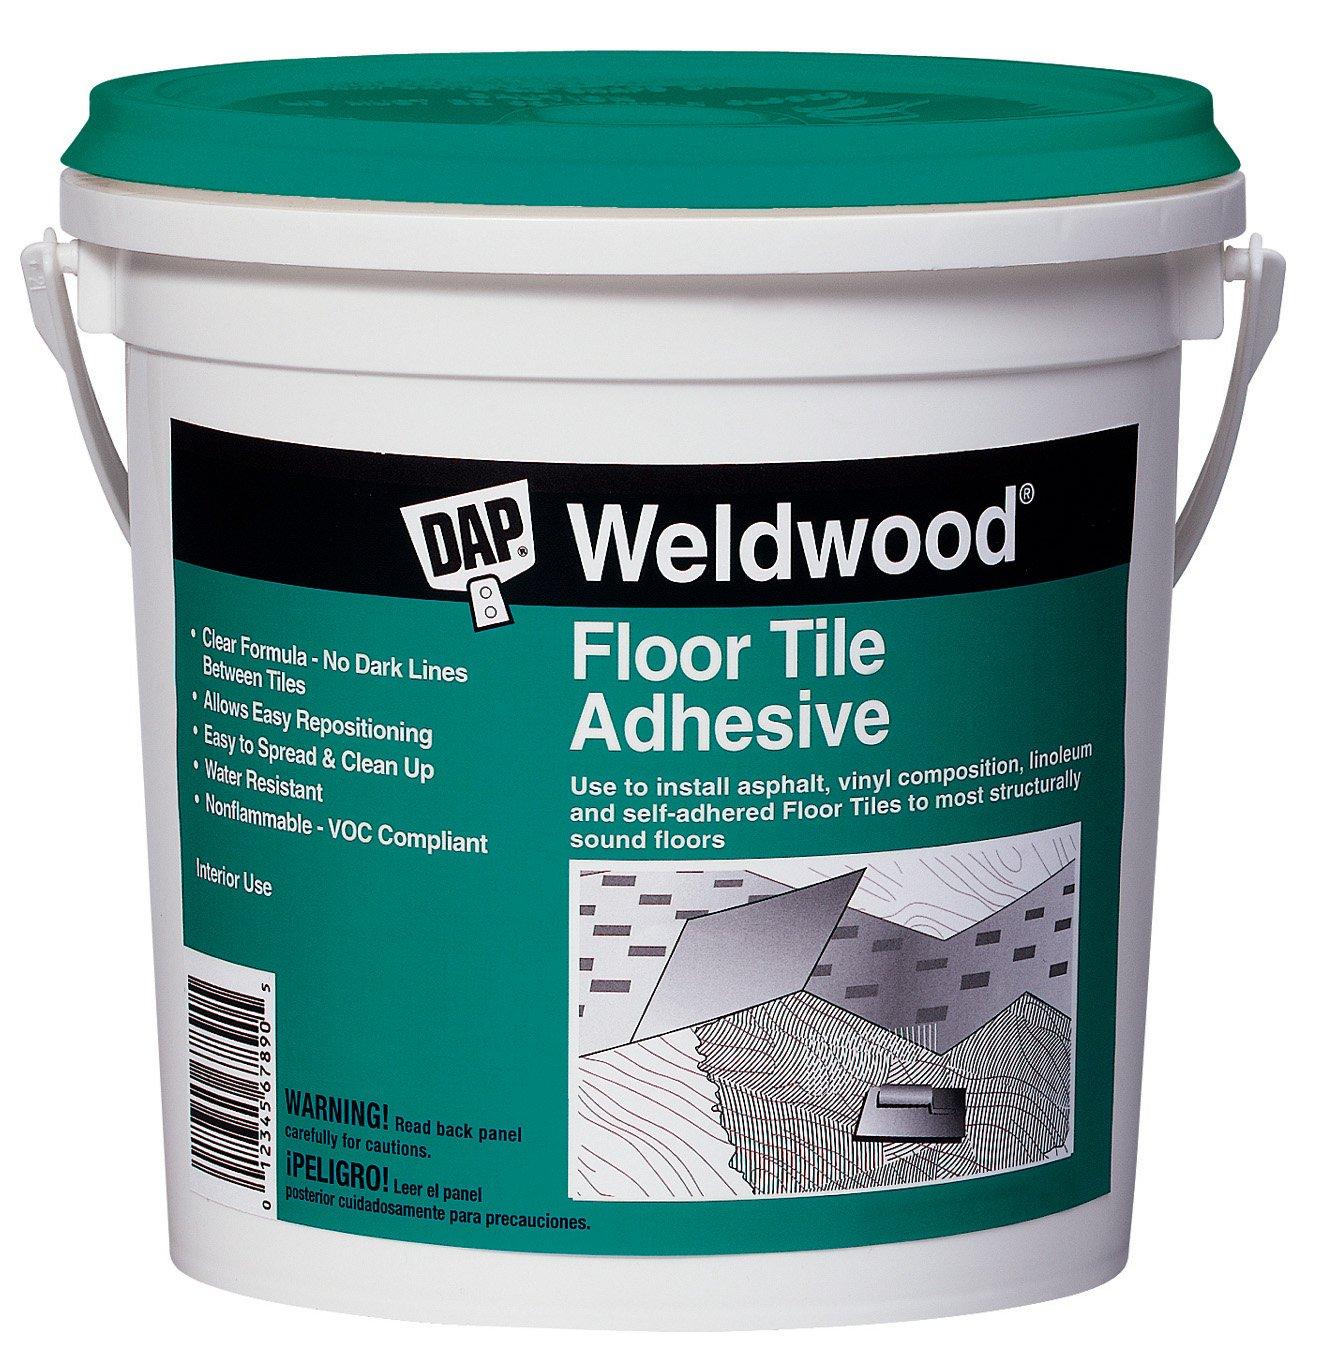 Amazon dap 00136 weldwood floor tile adhesive 1 quart home amazon dap 00136 weldwood floor tile adhesive 1 quart home improvement dailygadgetfo Images